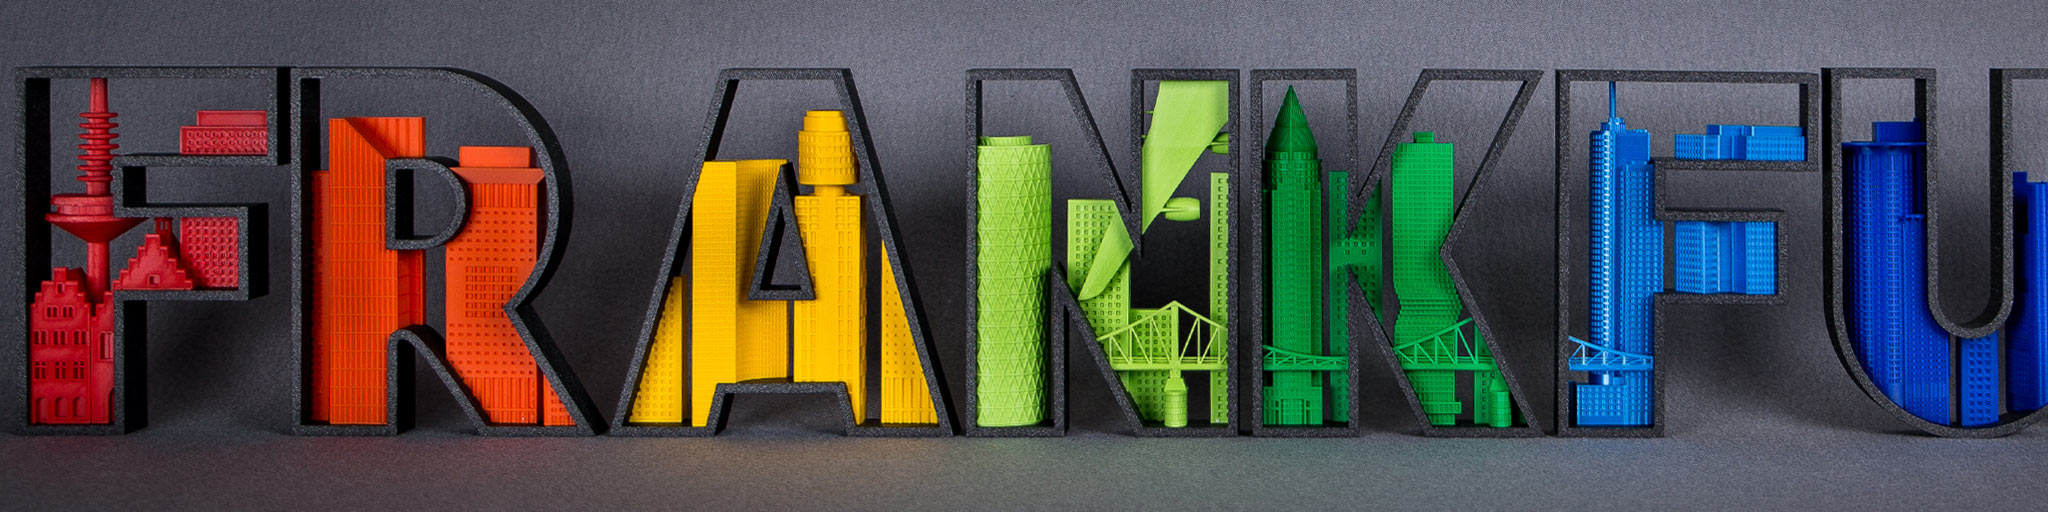 3D Druck Frankfurt - Logo aus 3D Drucker - Frankfurt Schrift